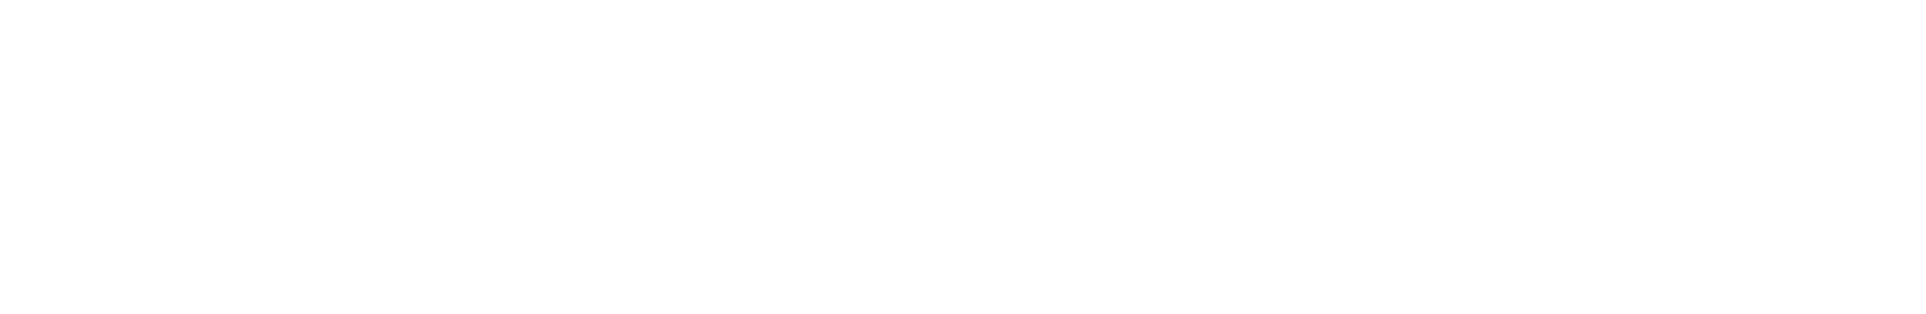 CallBell